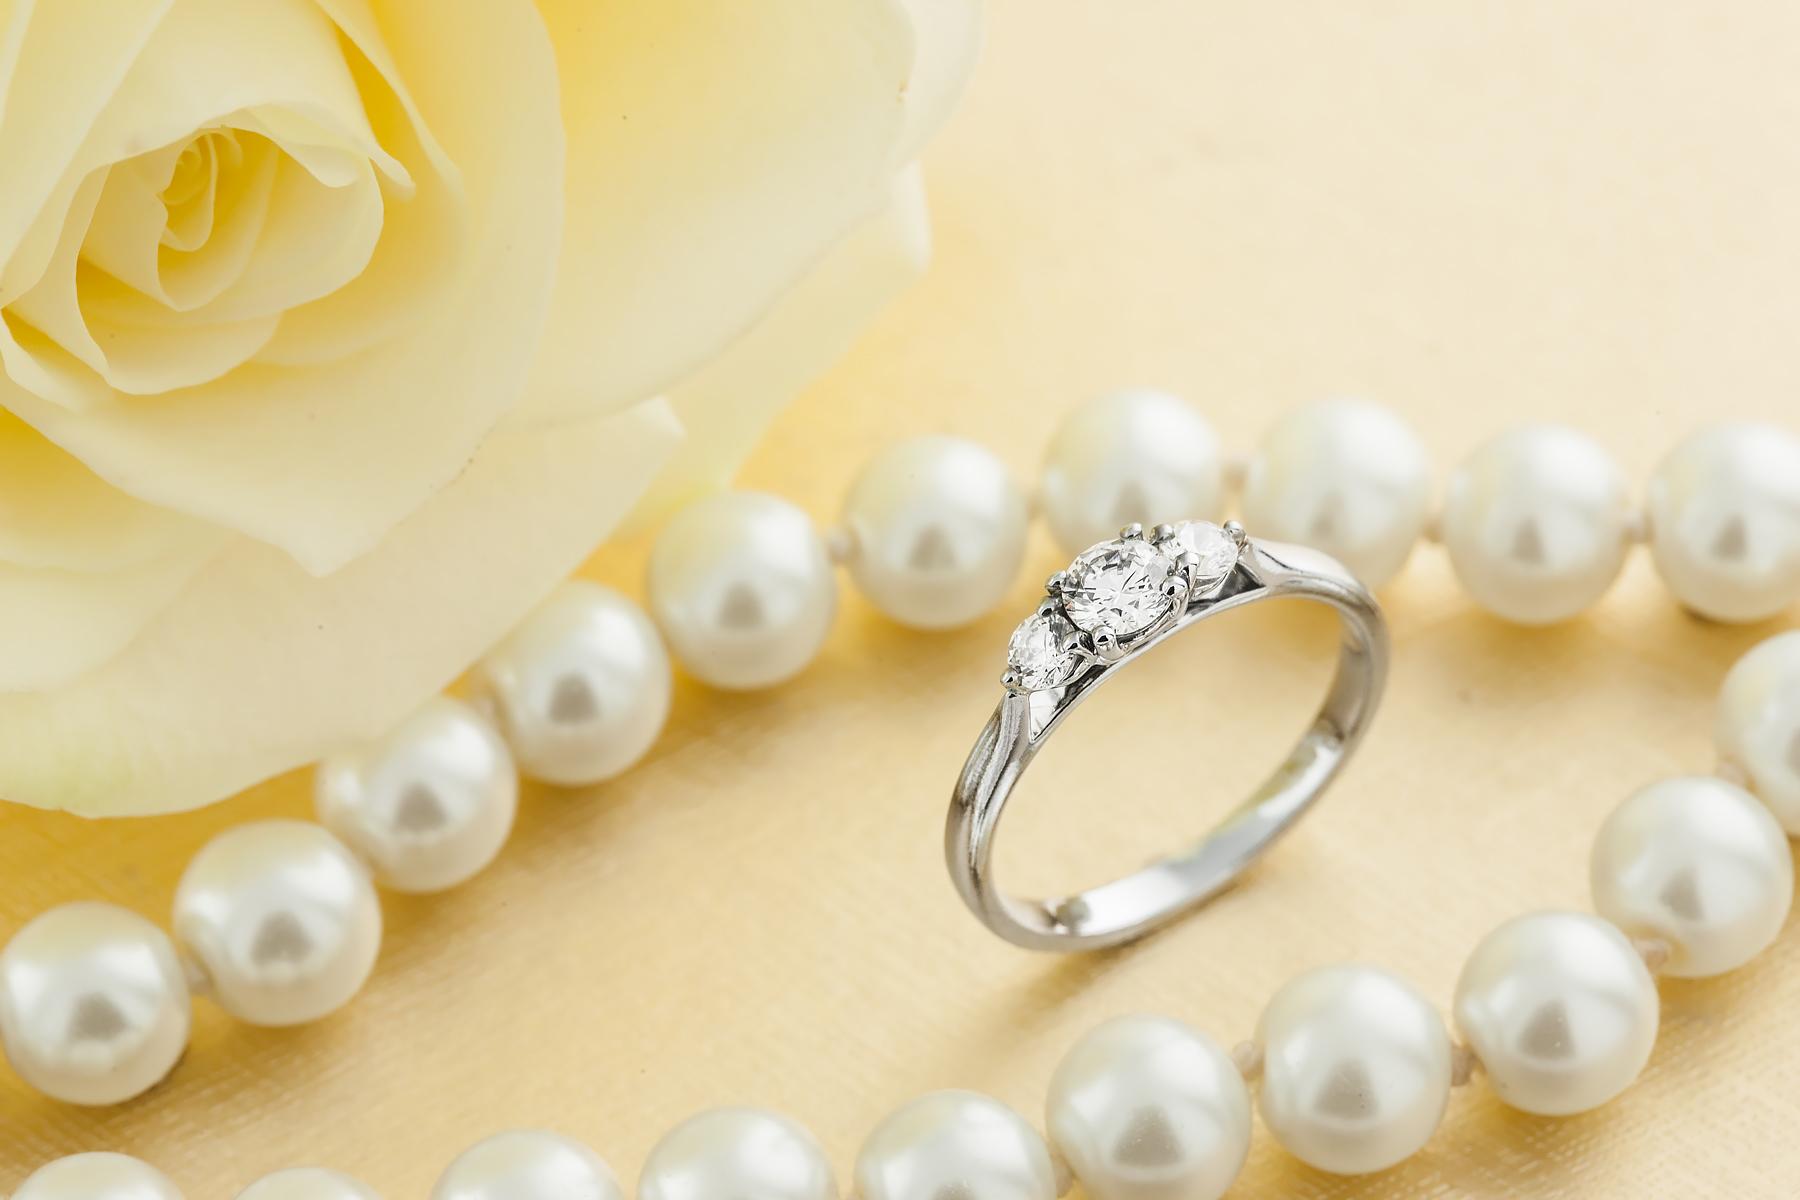 Inel de logodna/Inel cu 3 Diamante Dama Aur Alb 18kt cu Trei Diamante Rotund Briliant in Setare cu Gheare-img1